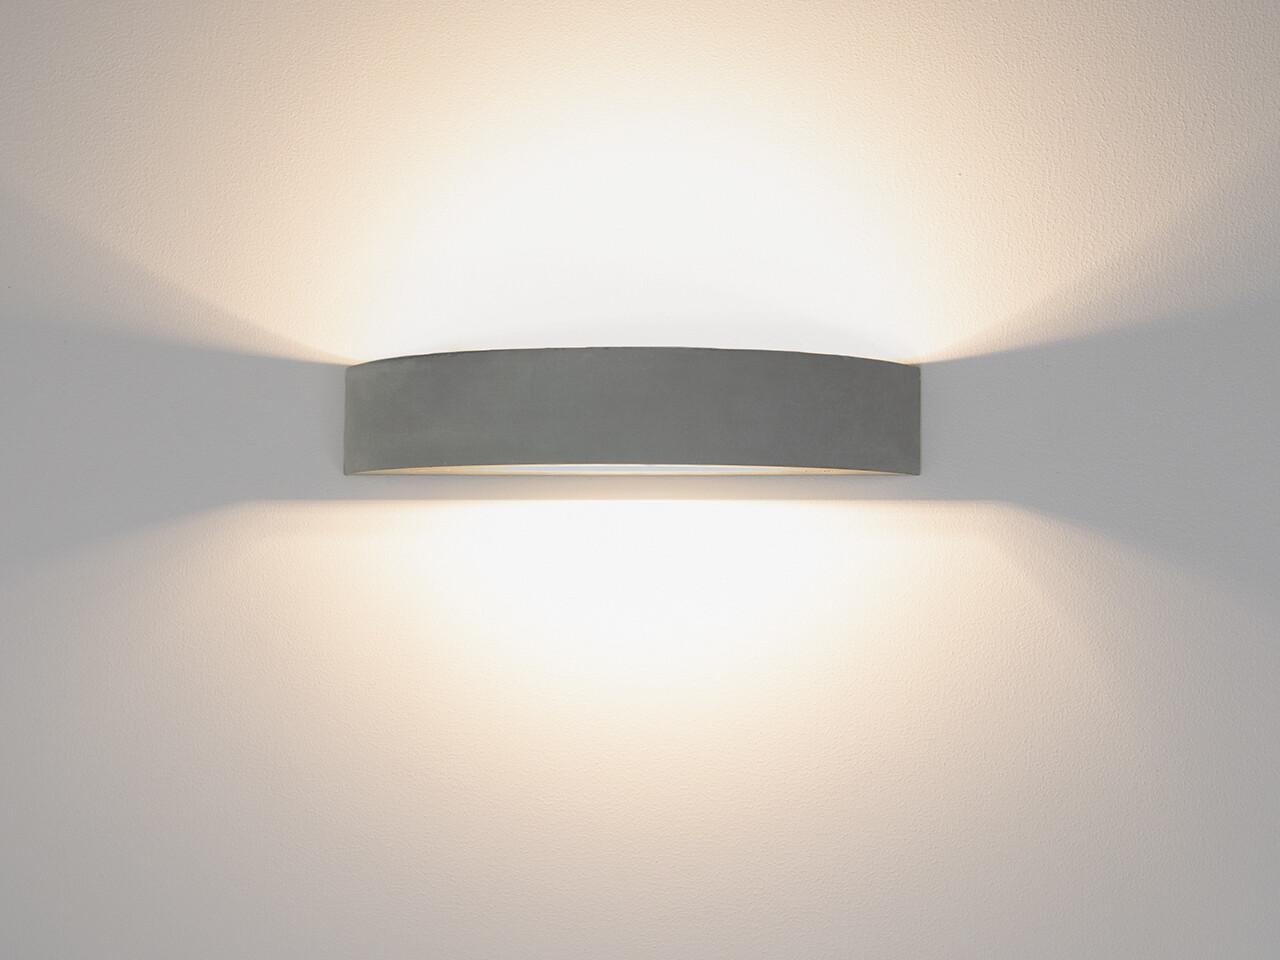 9010 Wandleuchte 1095B LED 10W, IP65, grün